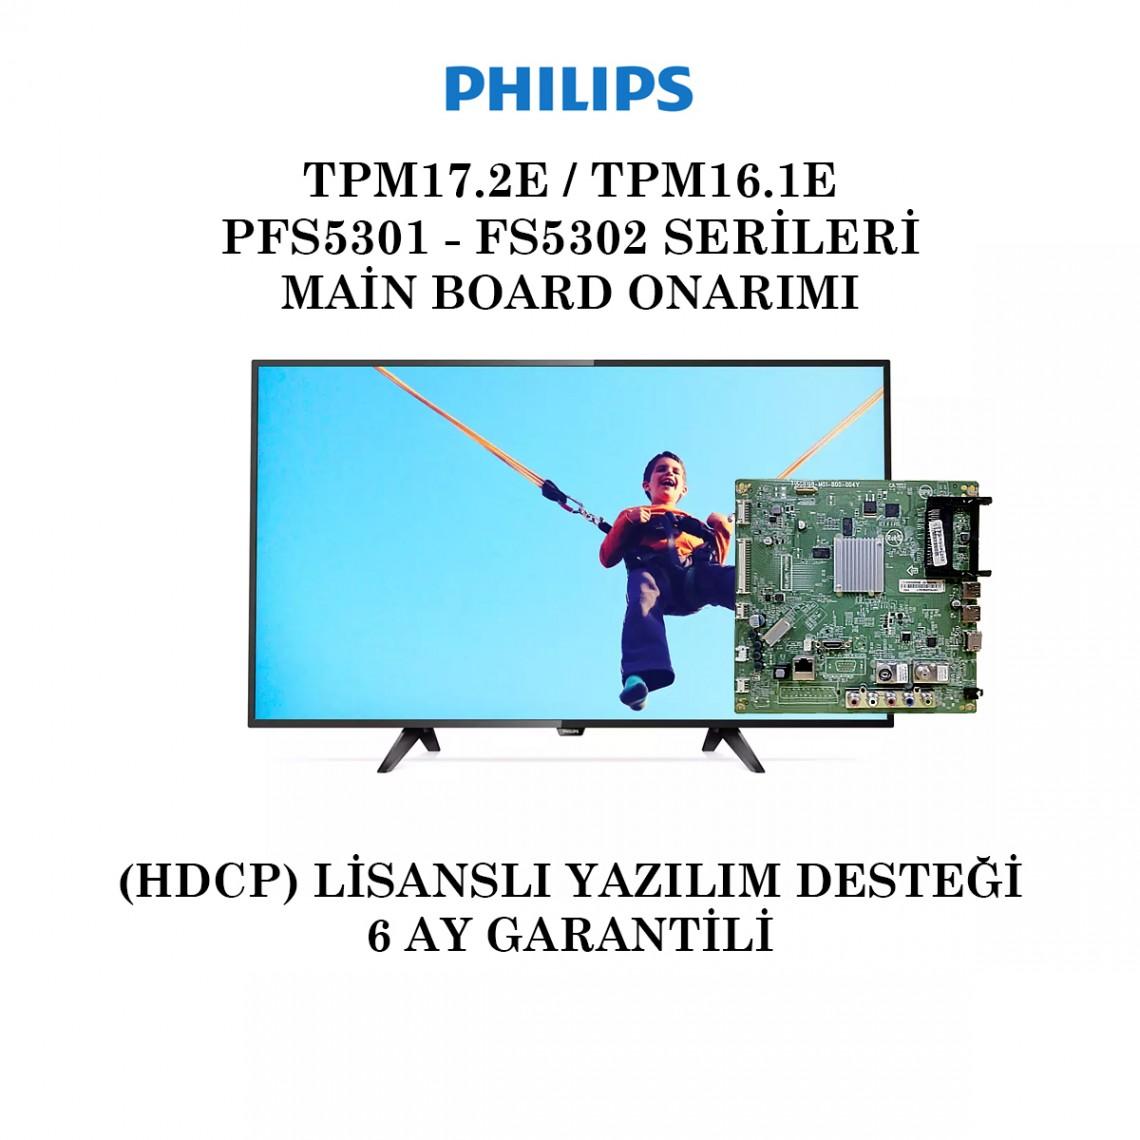 PHILIPS, 715G8198-M01-B00-004T, 715G8198-M01-B00-004Y, TPM17.2E , TPM16.1E, 43PFS5301/12, 49PFS5301/12, 43PFS5302/12, 49PFS5302/12, Main Board Onarımı